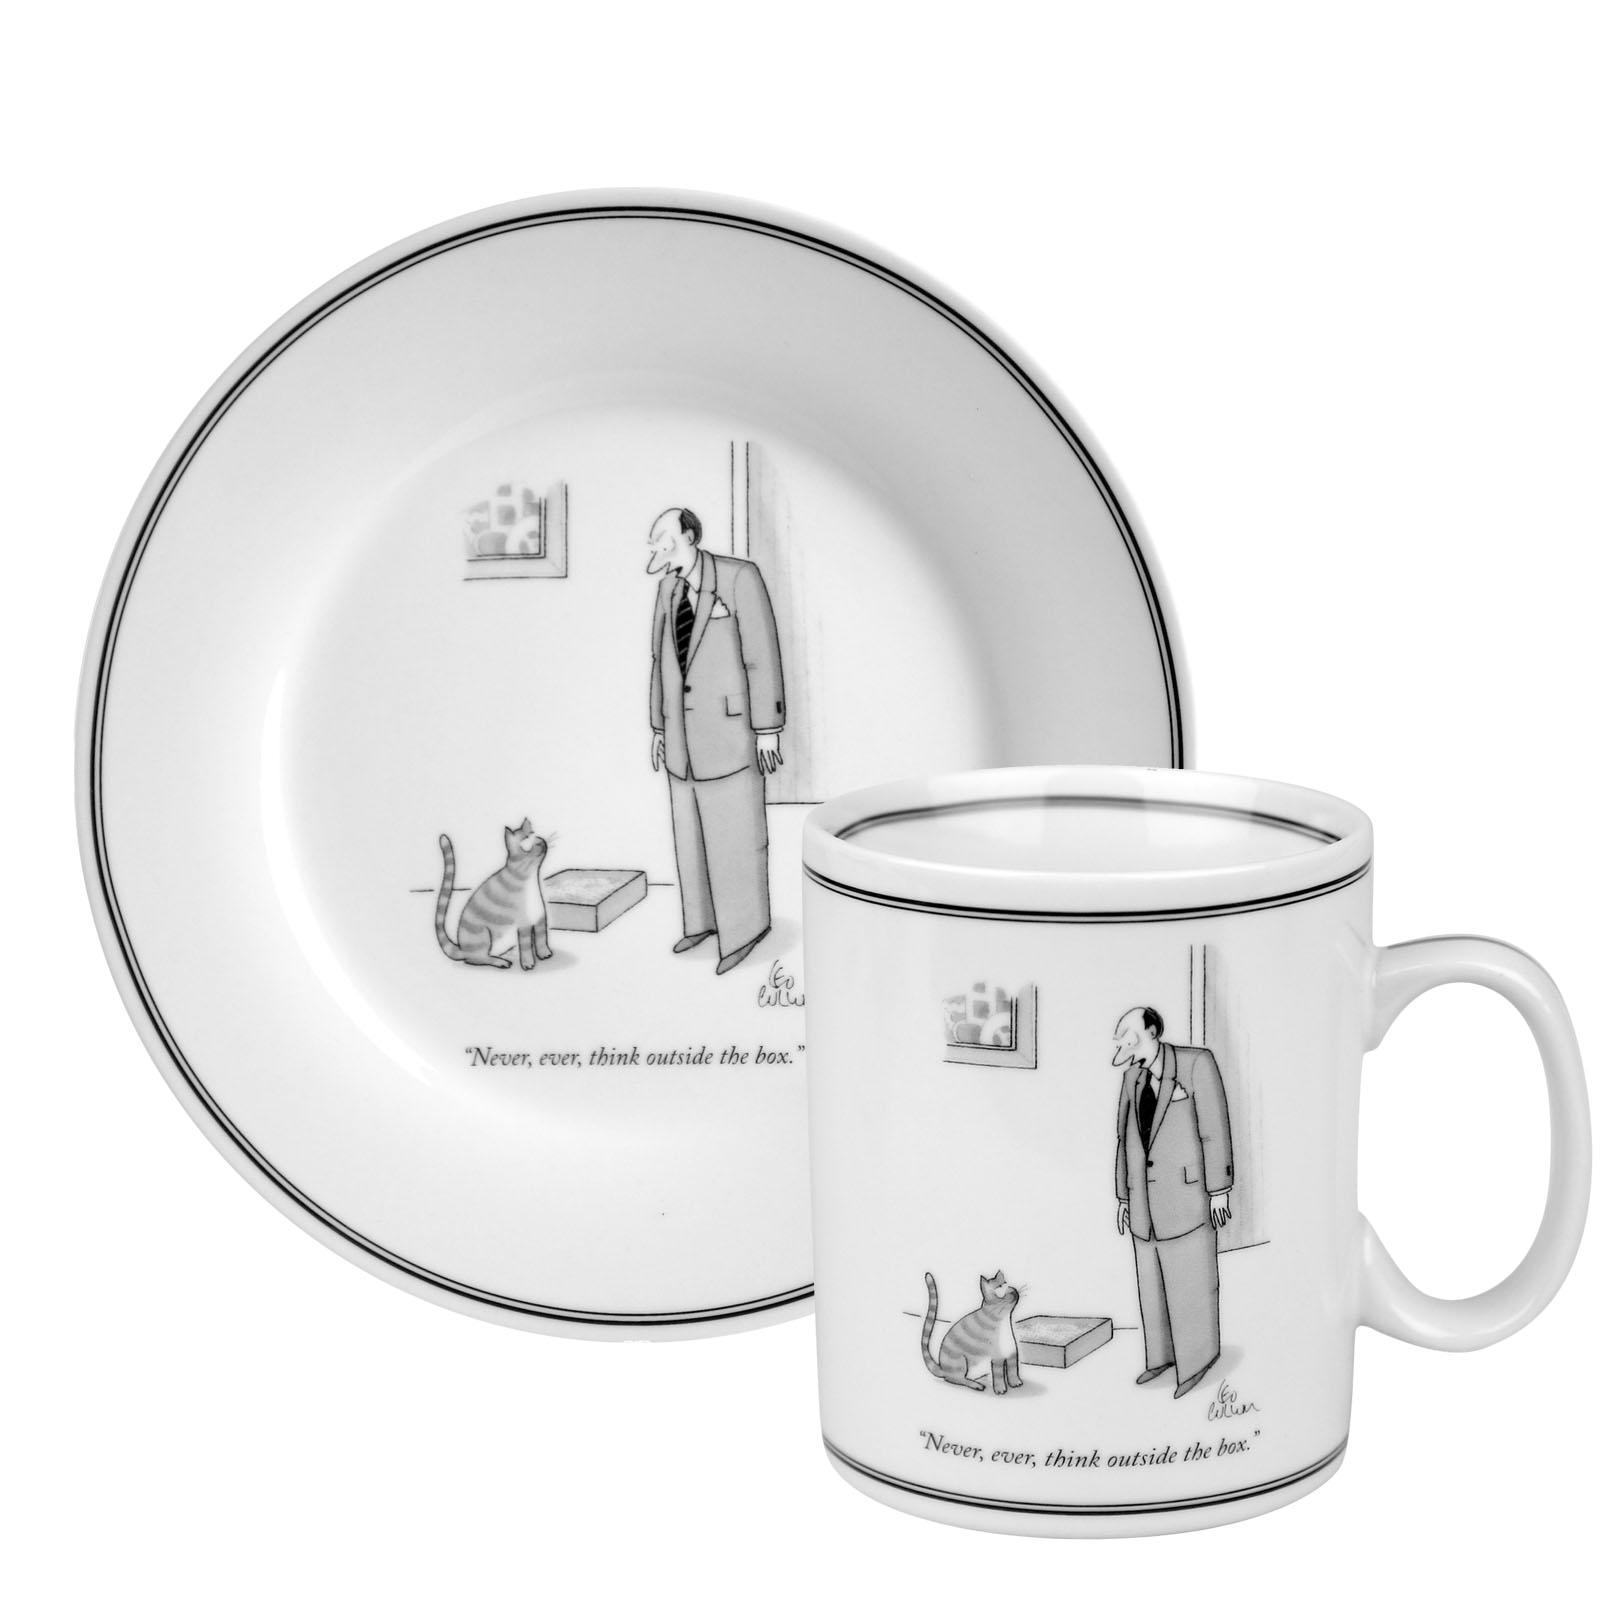 Konitz New Yorker Collection 'Outside The Box' Mug and Plate Set